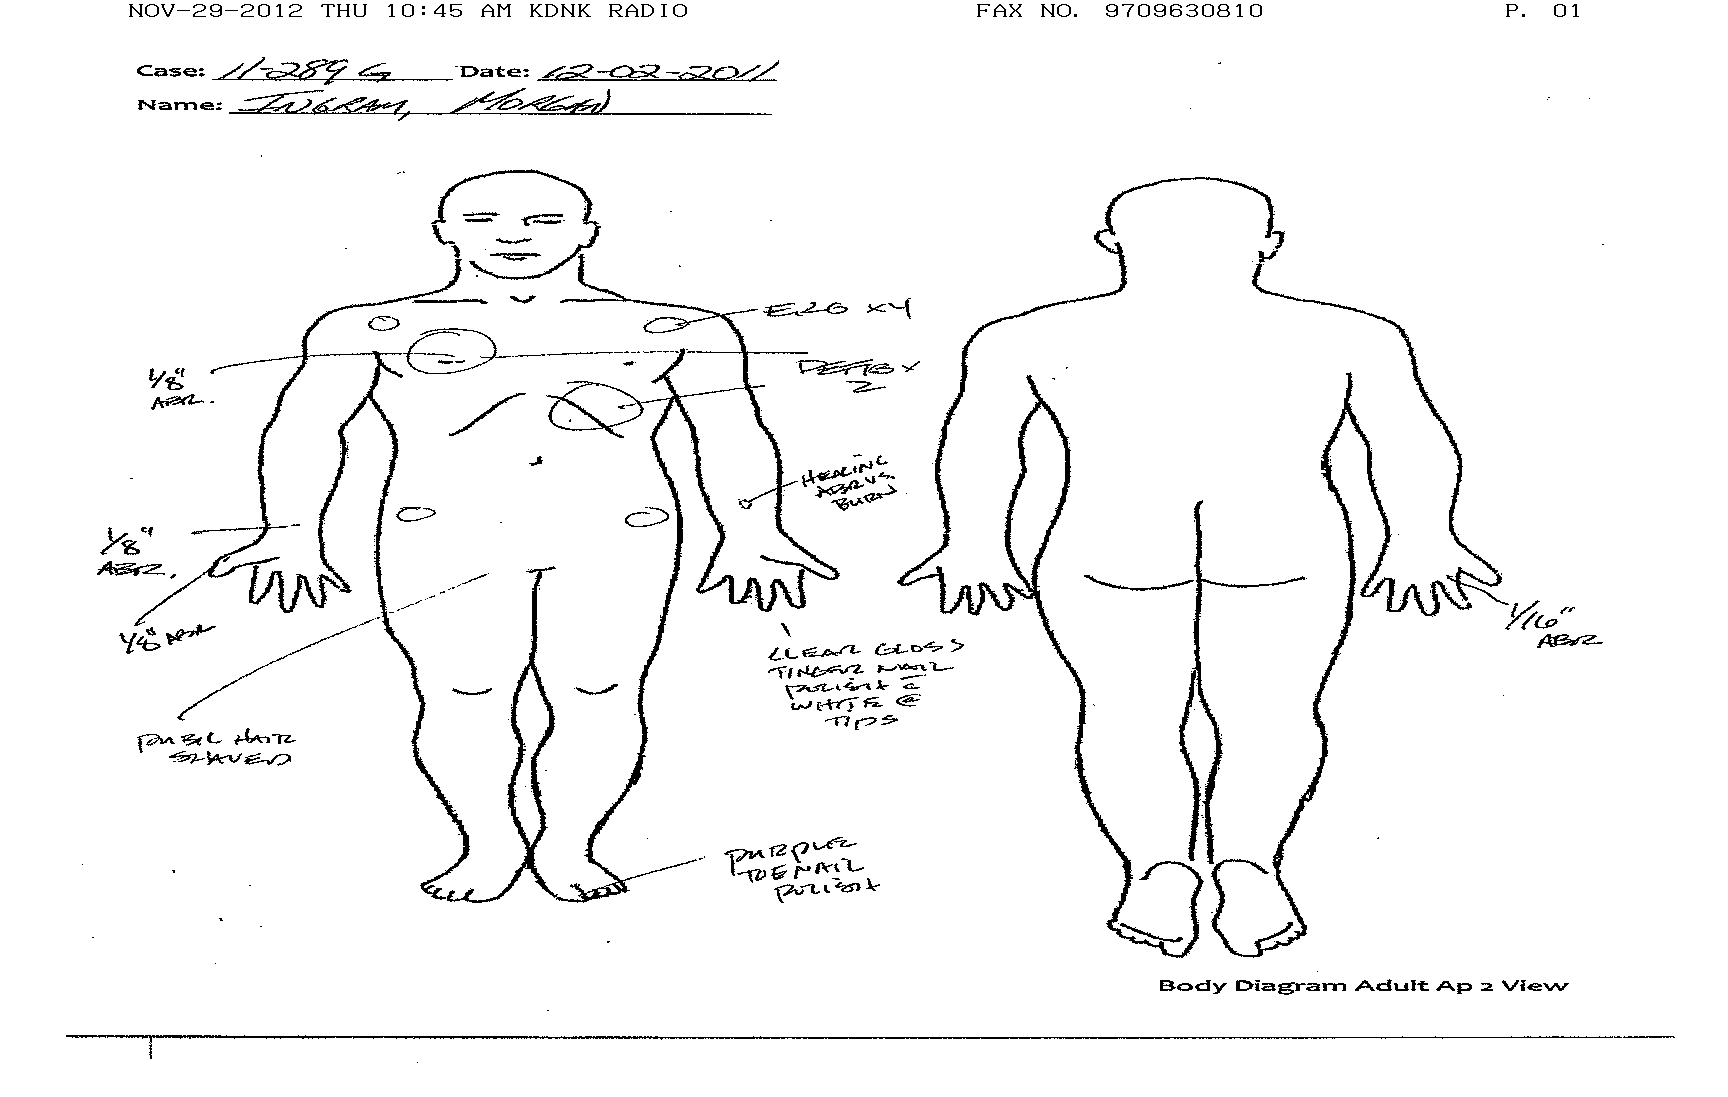 Body diagram for report example electrical circuit body diagram truth for morgan rh truthformorgan wordpress com body diagram for incident report body diagram for incident report ccuart Image collections